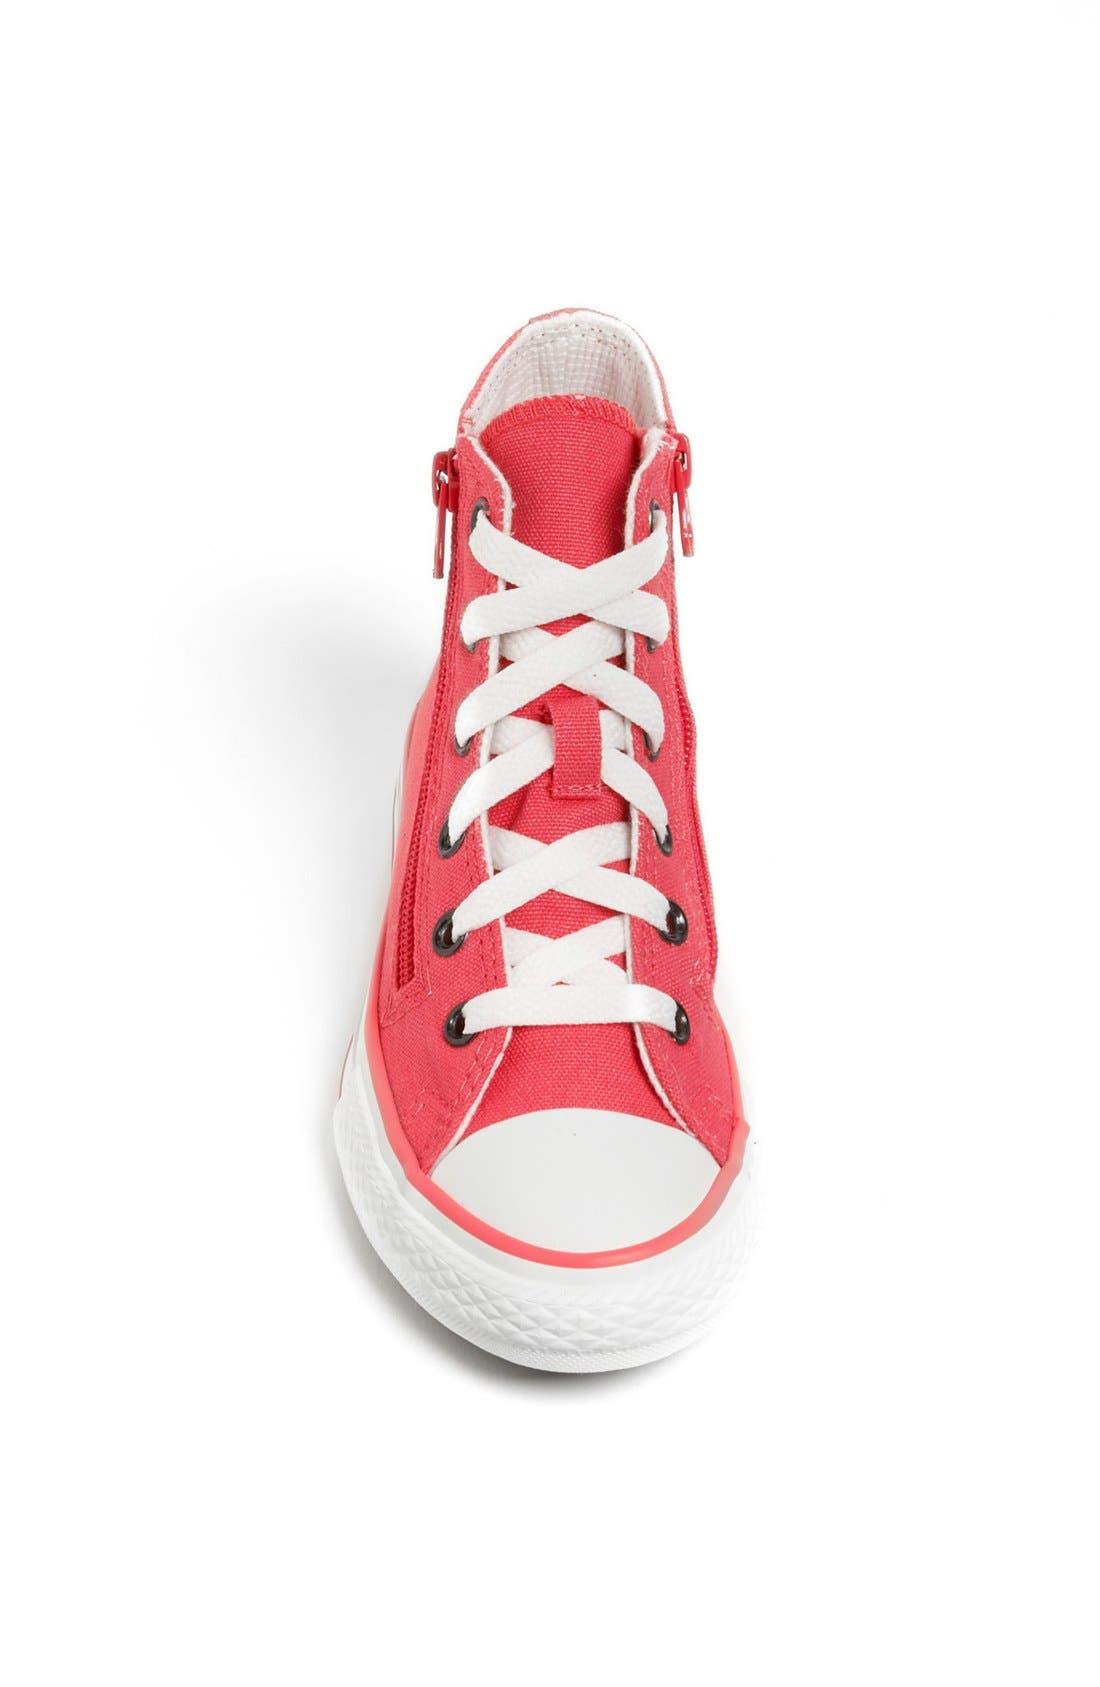 Alternate Image 3  - Converse Chuck Taylor® All Star® High Top Sneaker (Toddler, Little Kid & Big Kid)